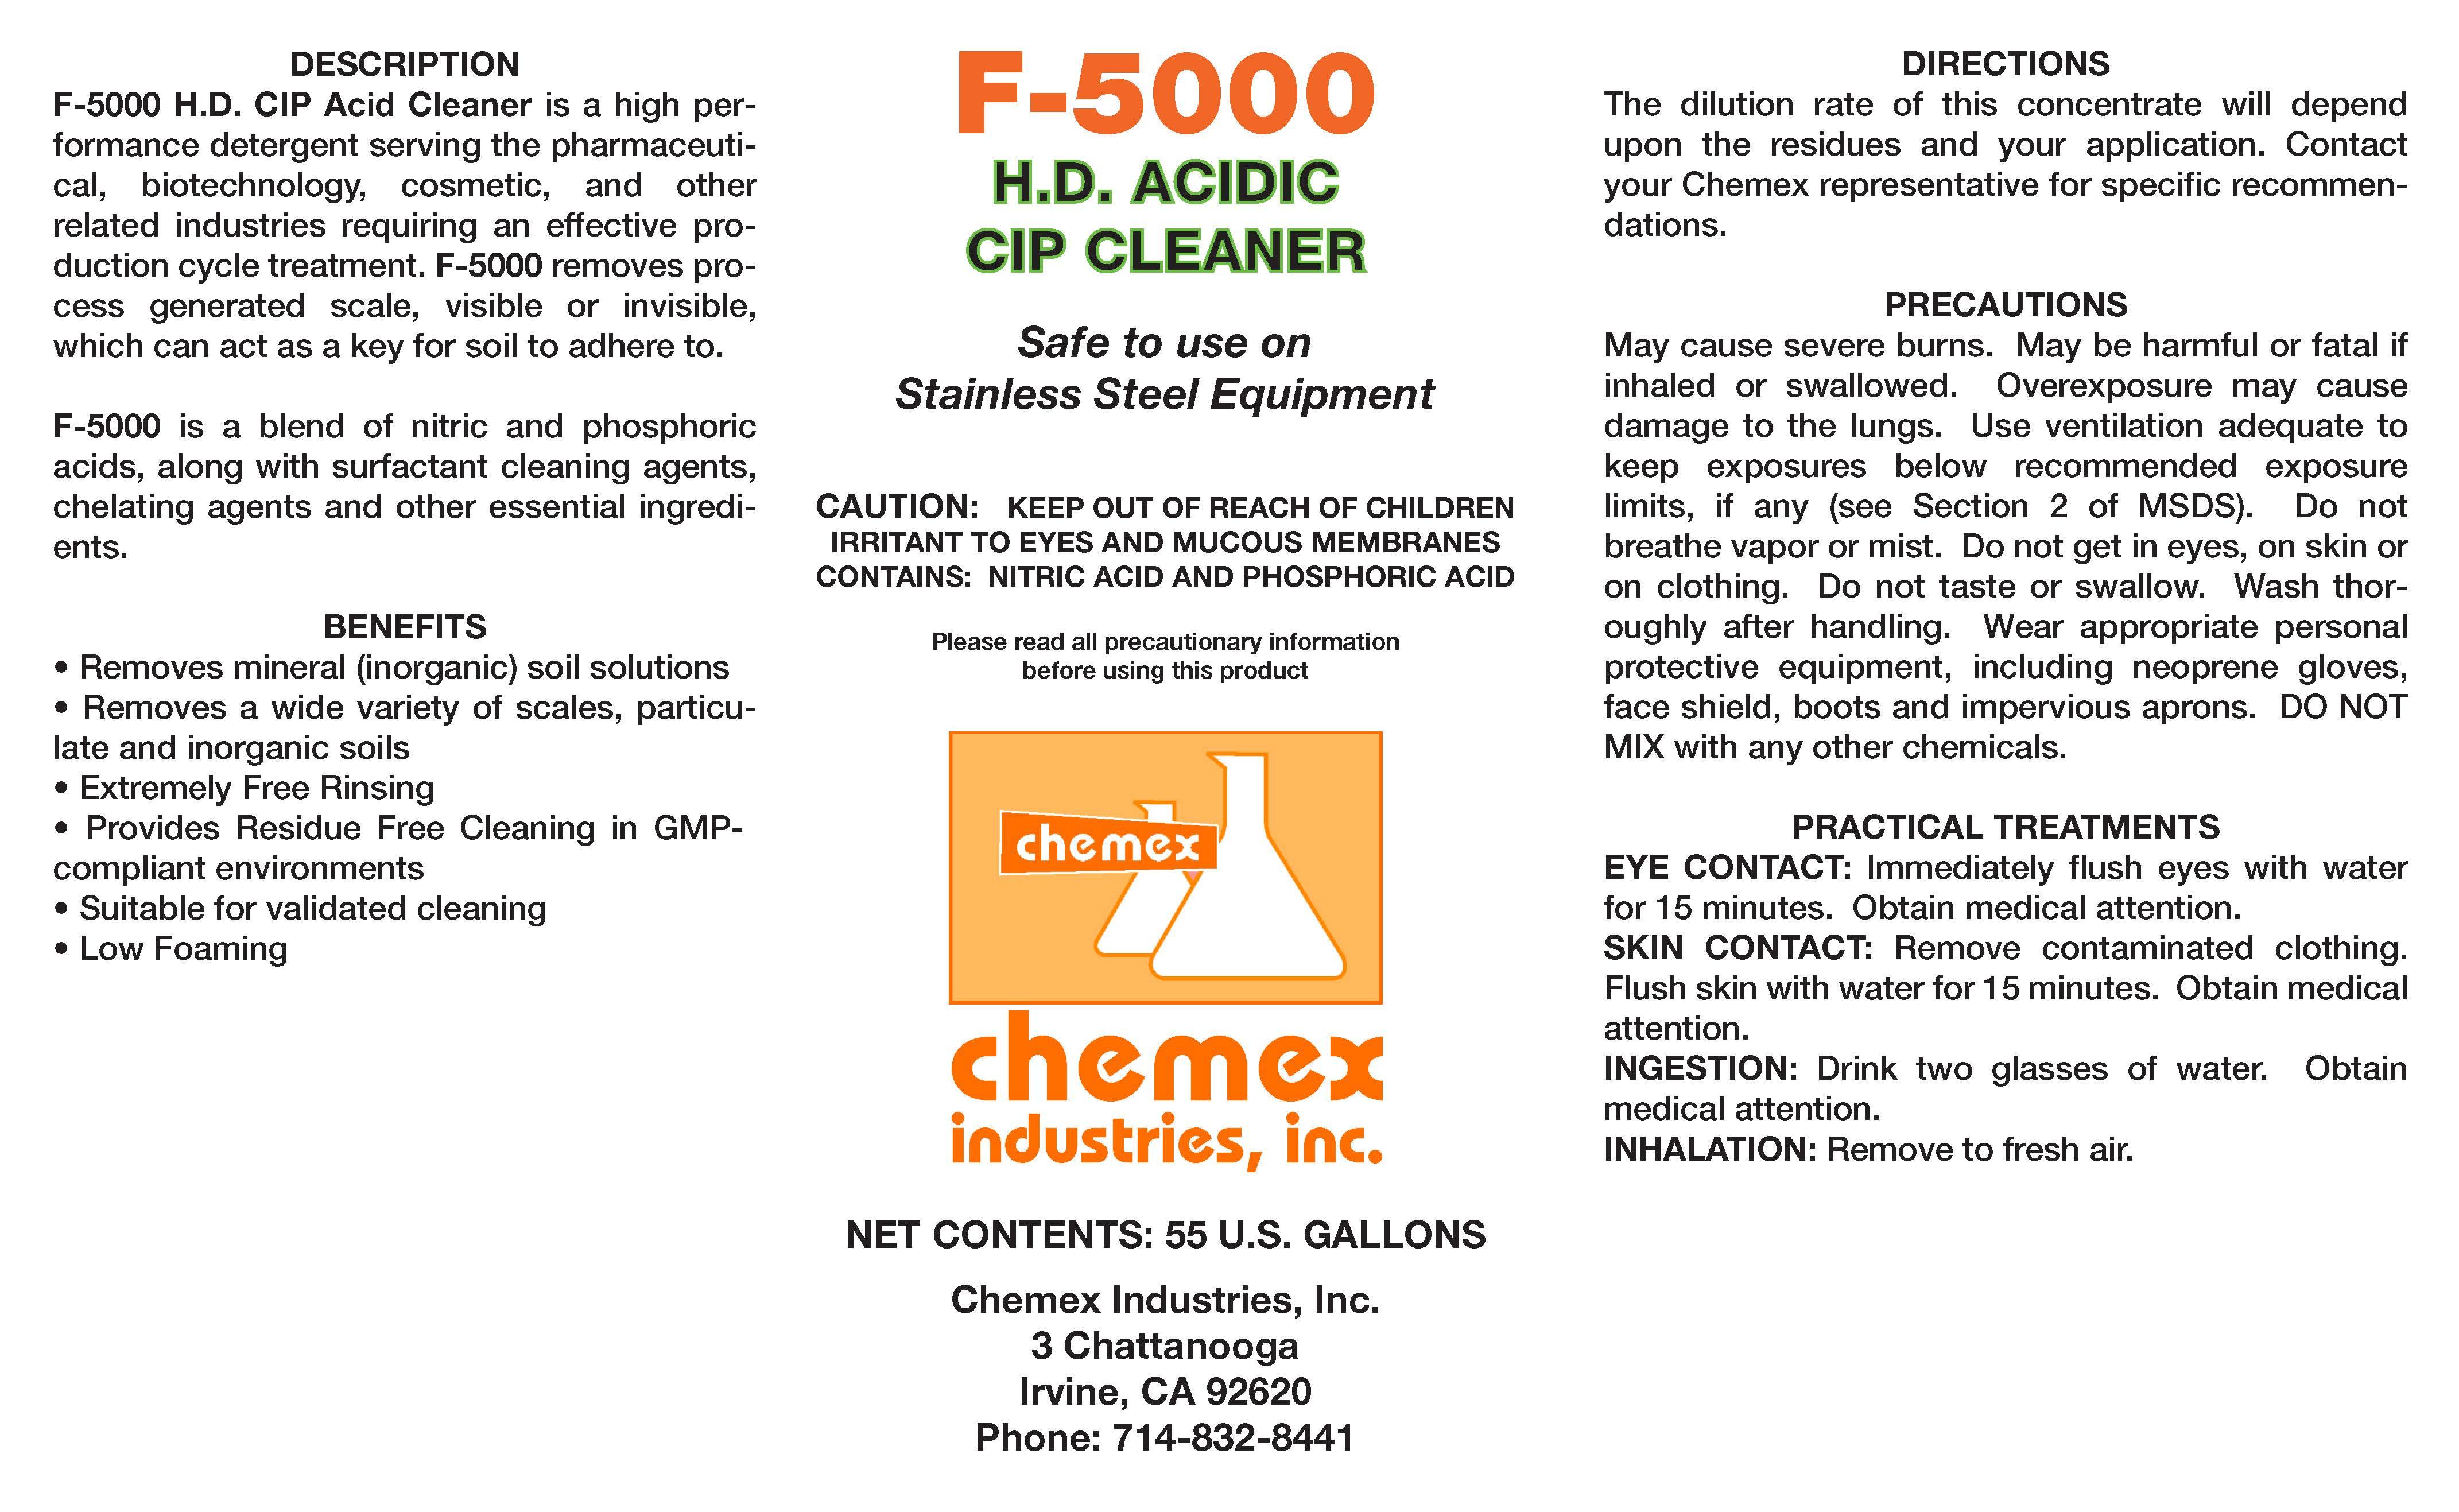 hd acidic acid cleaner, nitric and phosphoric acid cleaner